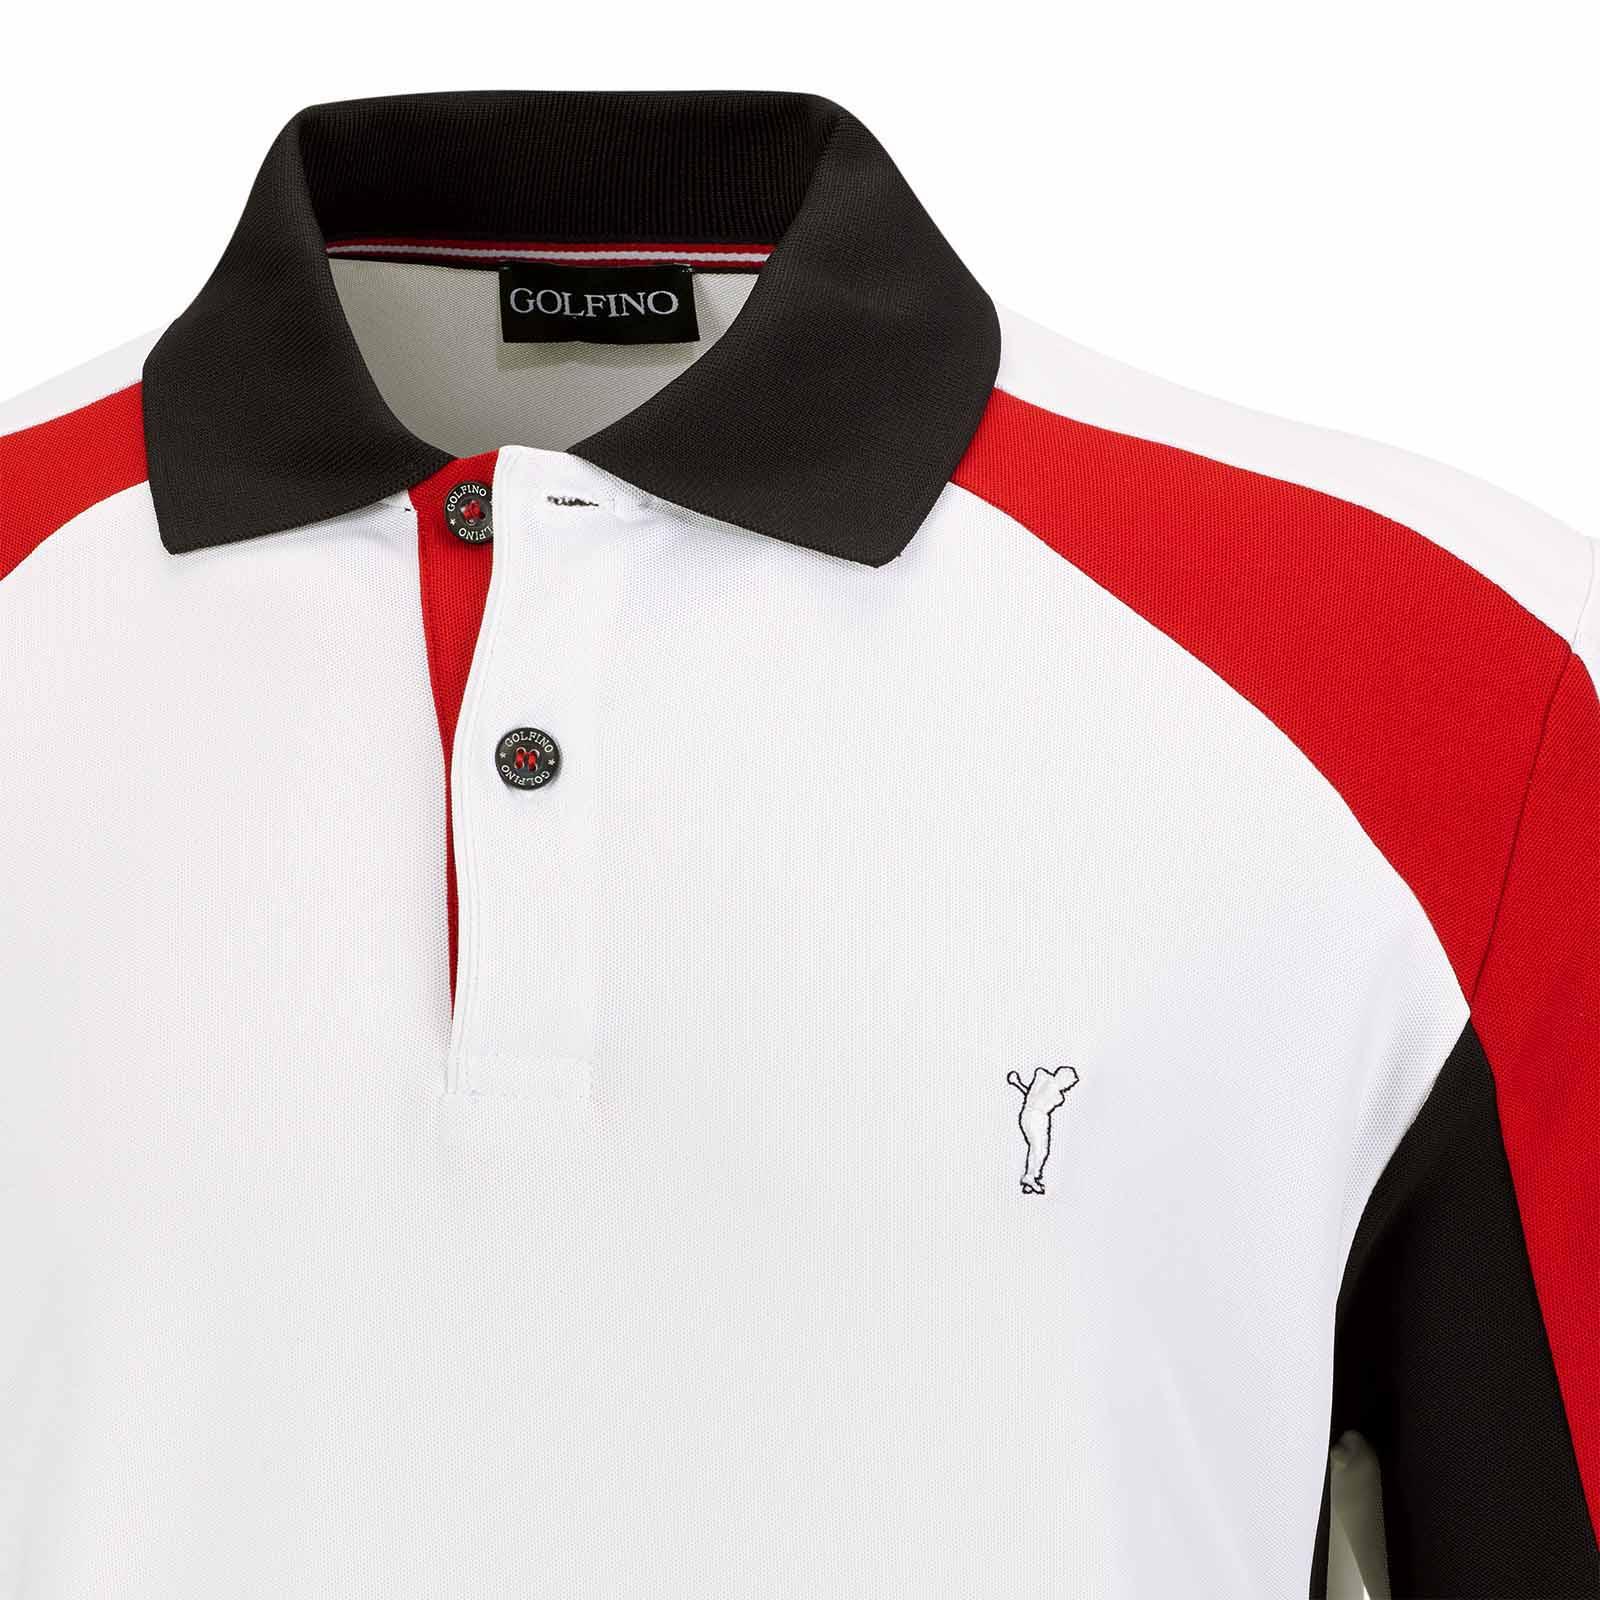 Herren Langarm Performance Golfpolo mit Moisture Management